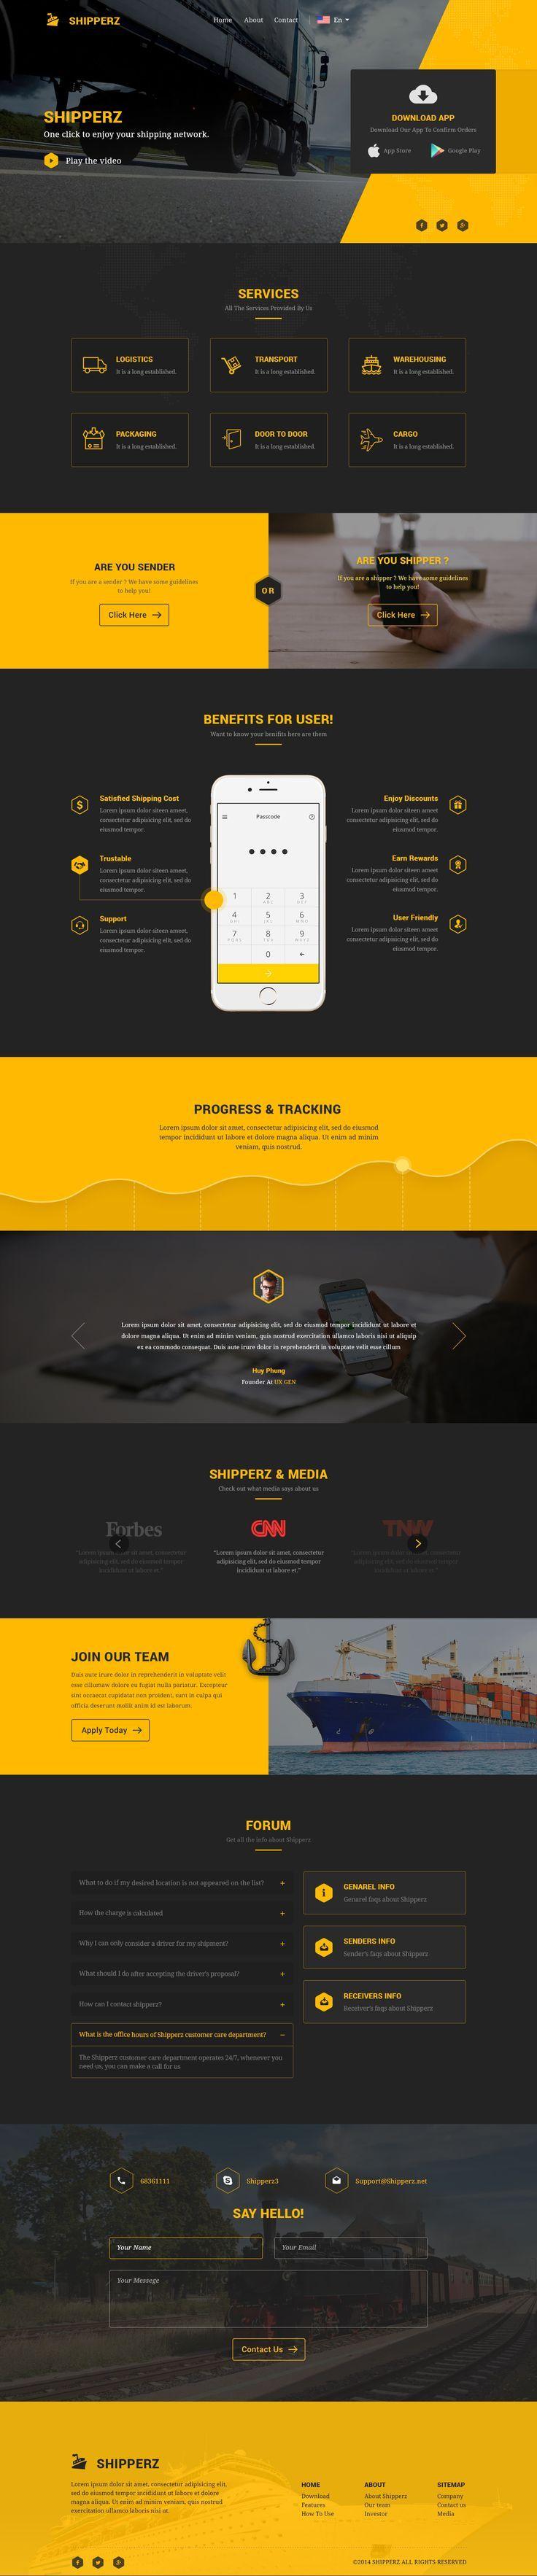 Landing Page Design. Web Design. Opus Online.